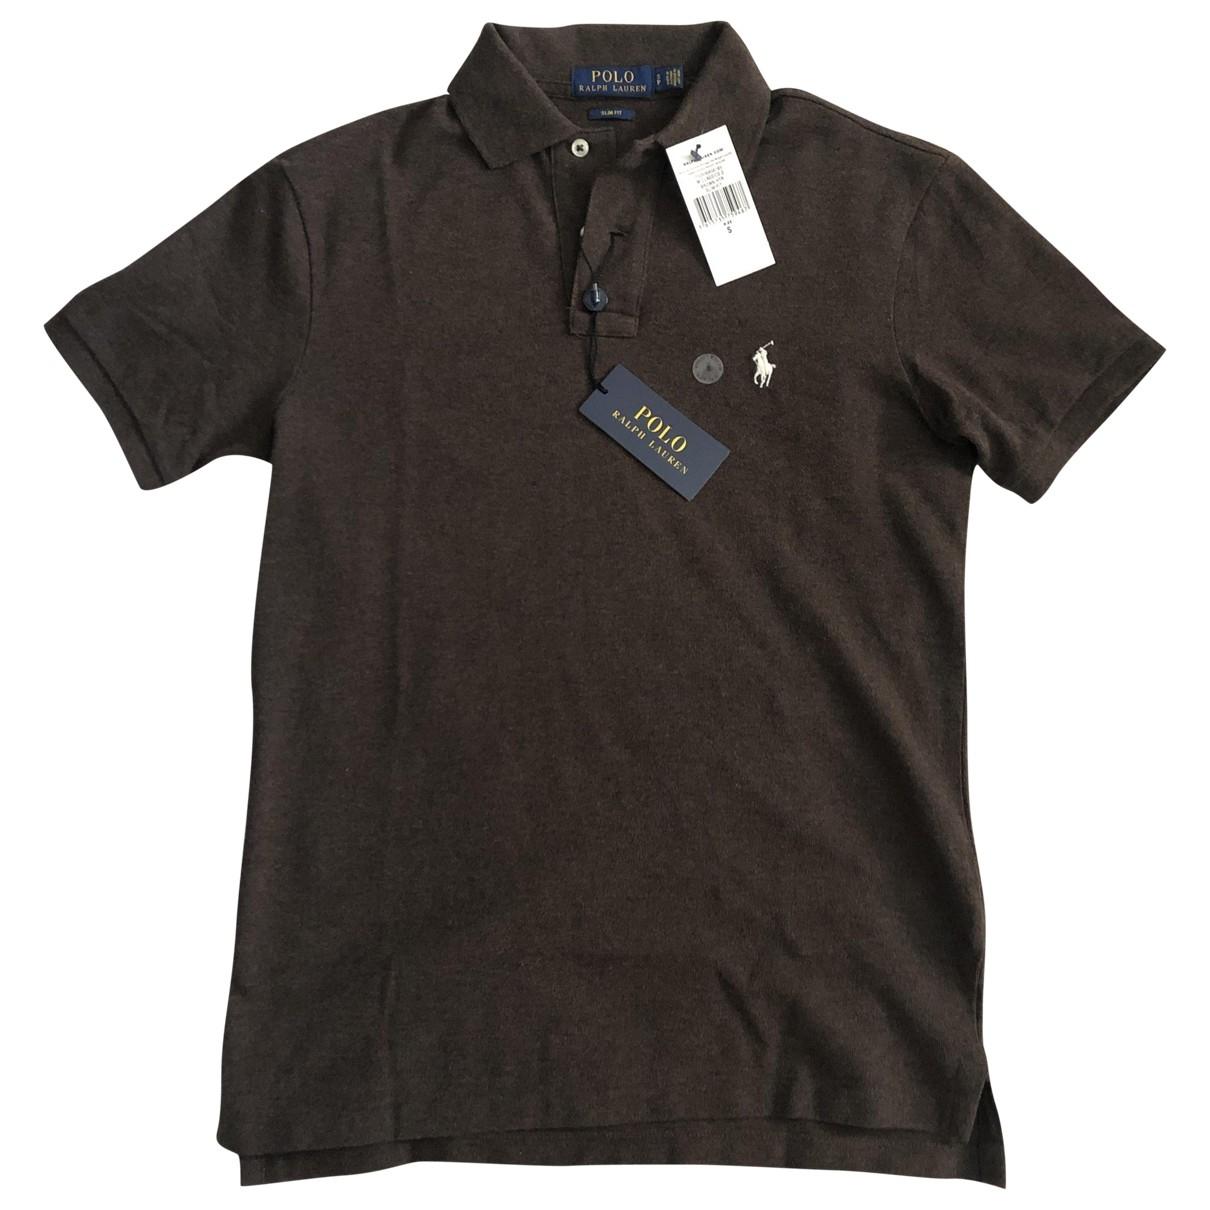 Polo Ralph Lauren \N Poloshirts in  Braun Baumwolle